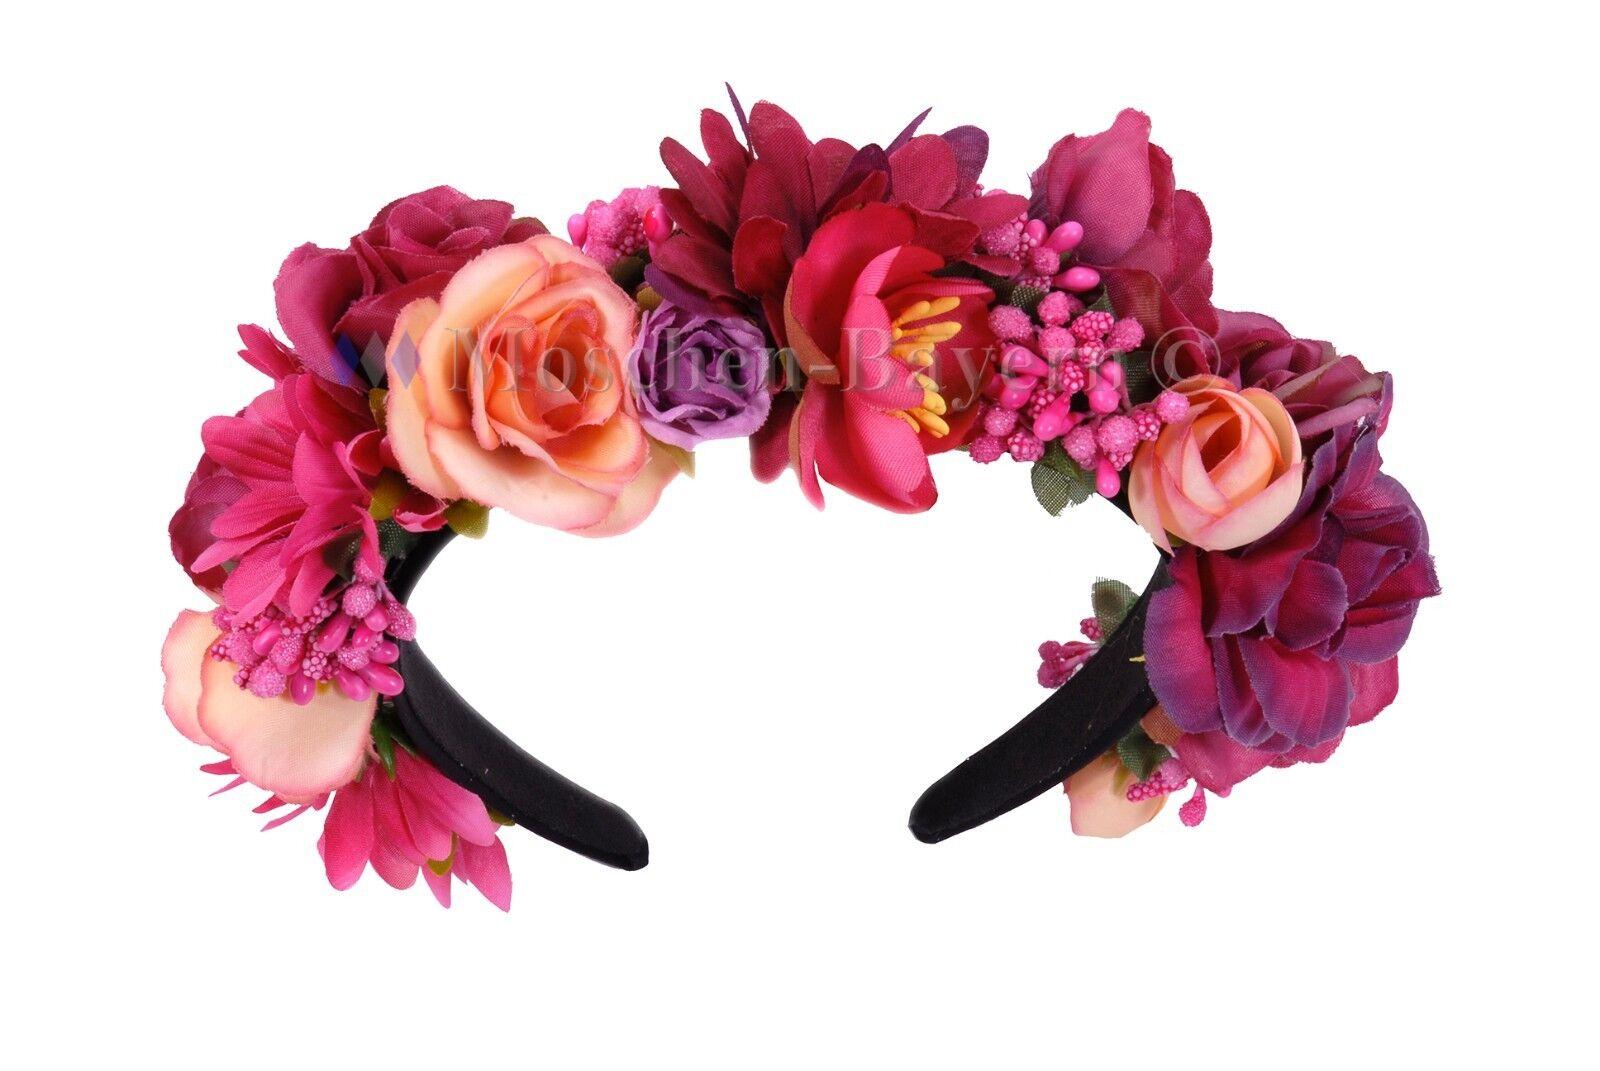 trachten blumenkranz haarreif blumen haare haarband haarschmuck hochzeit pink ebay. Black Bedroom Furniture Sets. Home Design Ideas